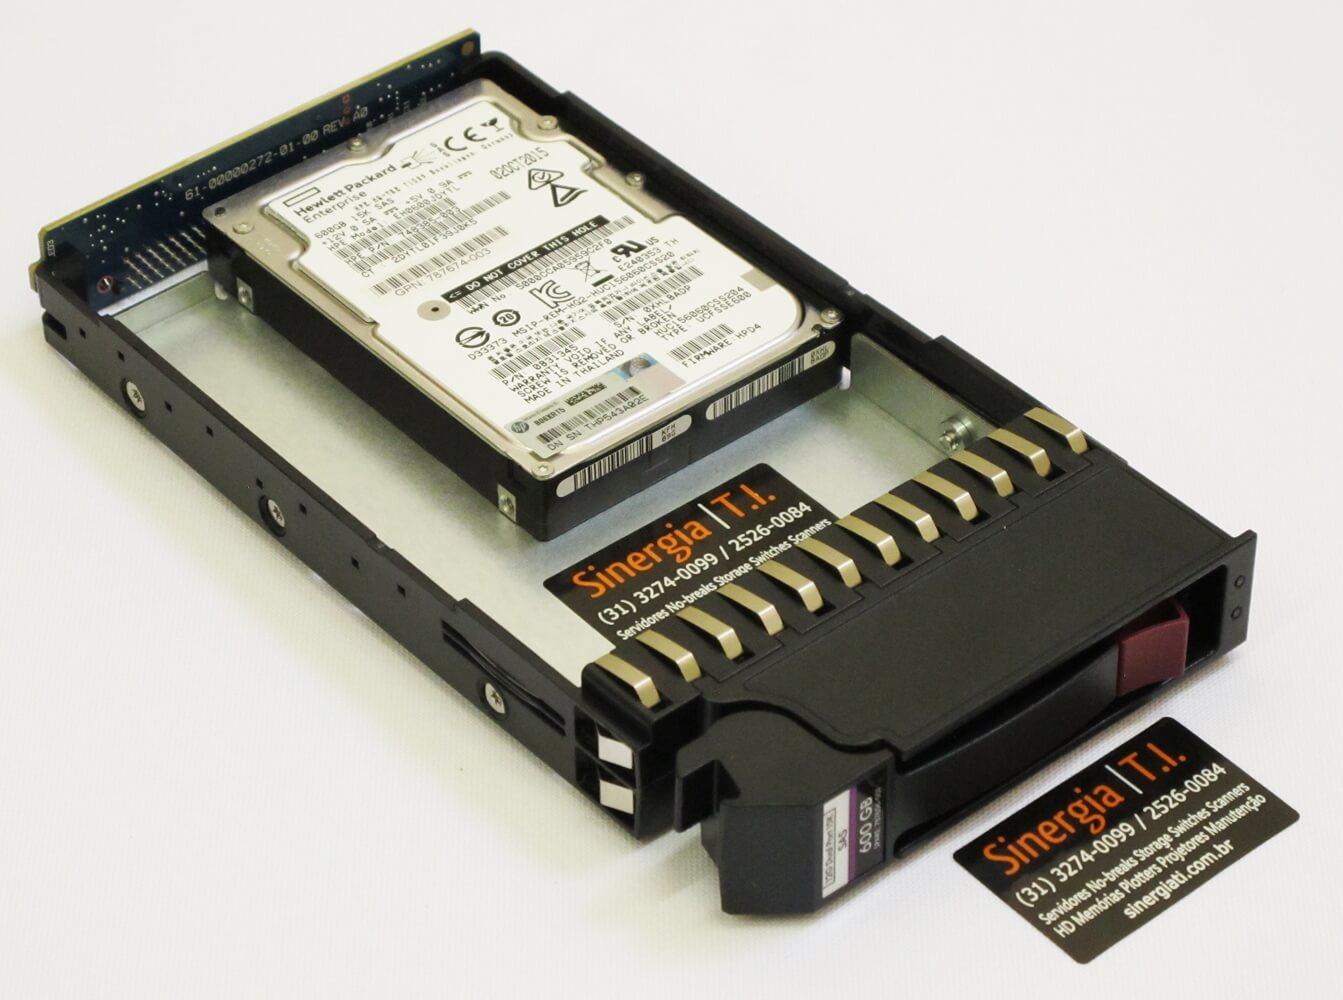 "EH0600JDYTL HD HPE 600GB SAS 12Gbps 15K RPM LFF 3,5"" Enterprise Hot-Plug Storage P2000 G3 e MSA pronta entrega"